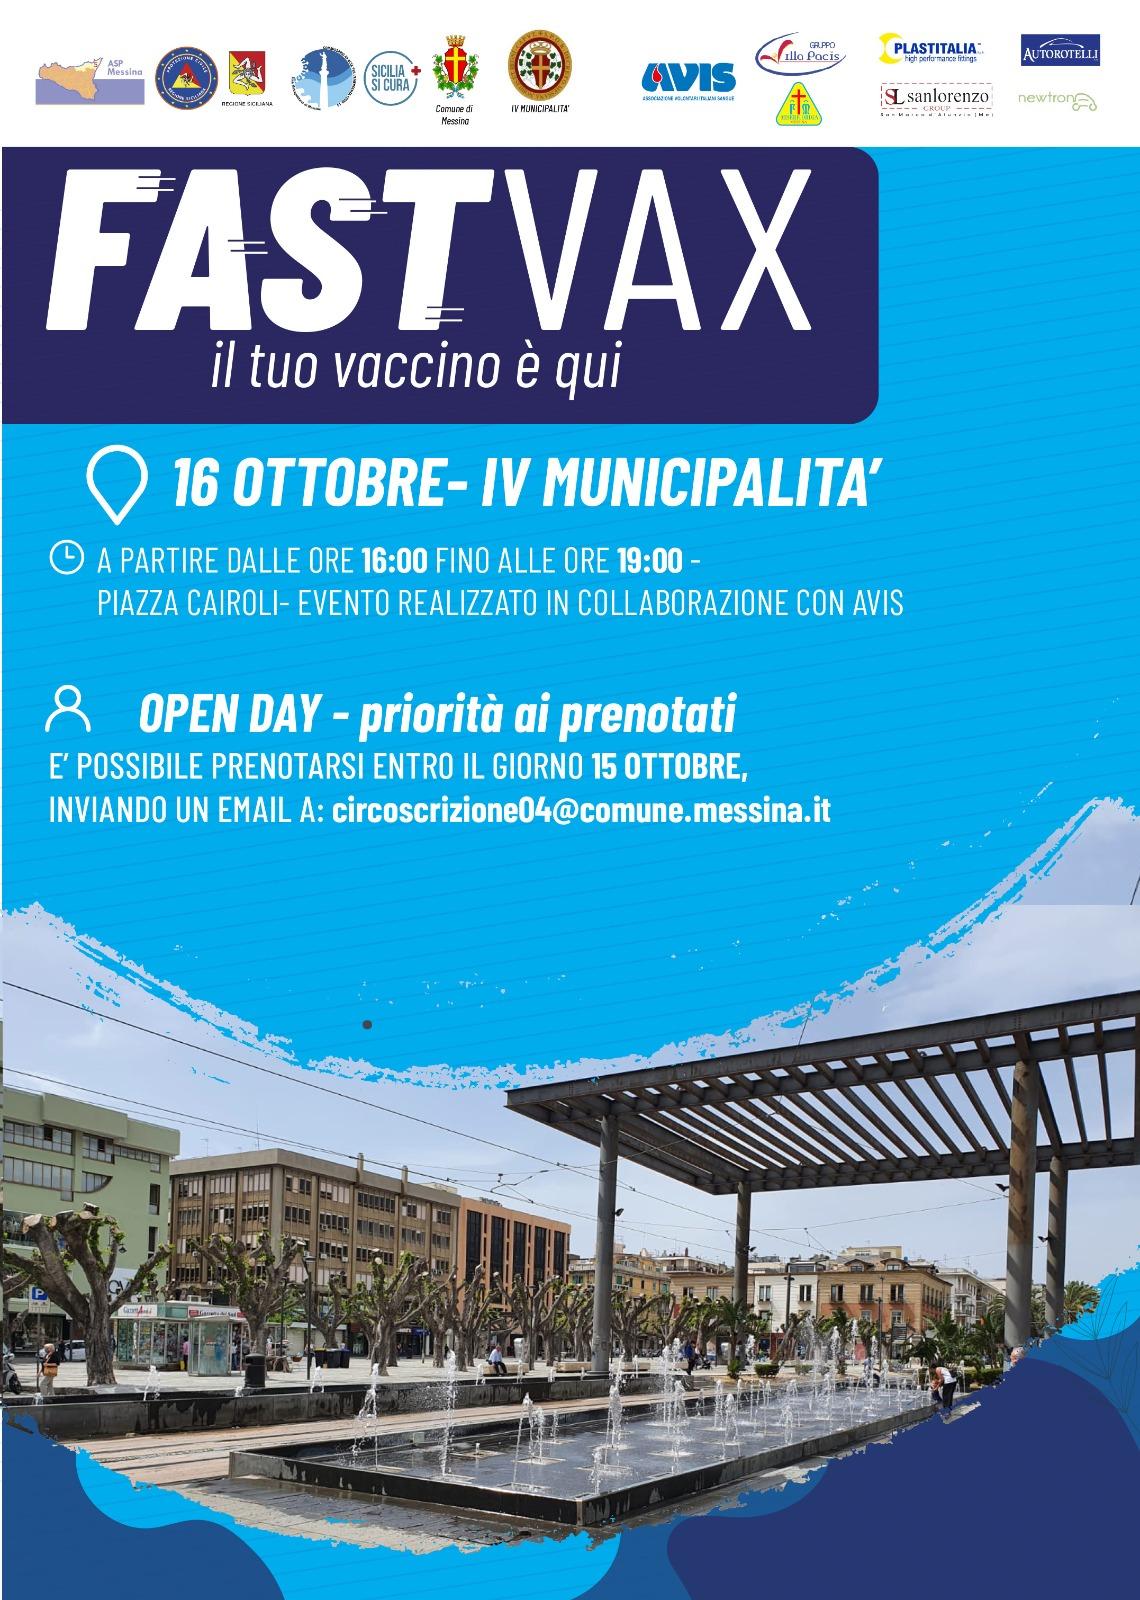 locandina fast vax vaccino covid a piazza cairoli